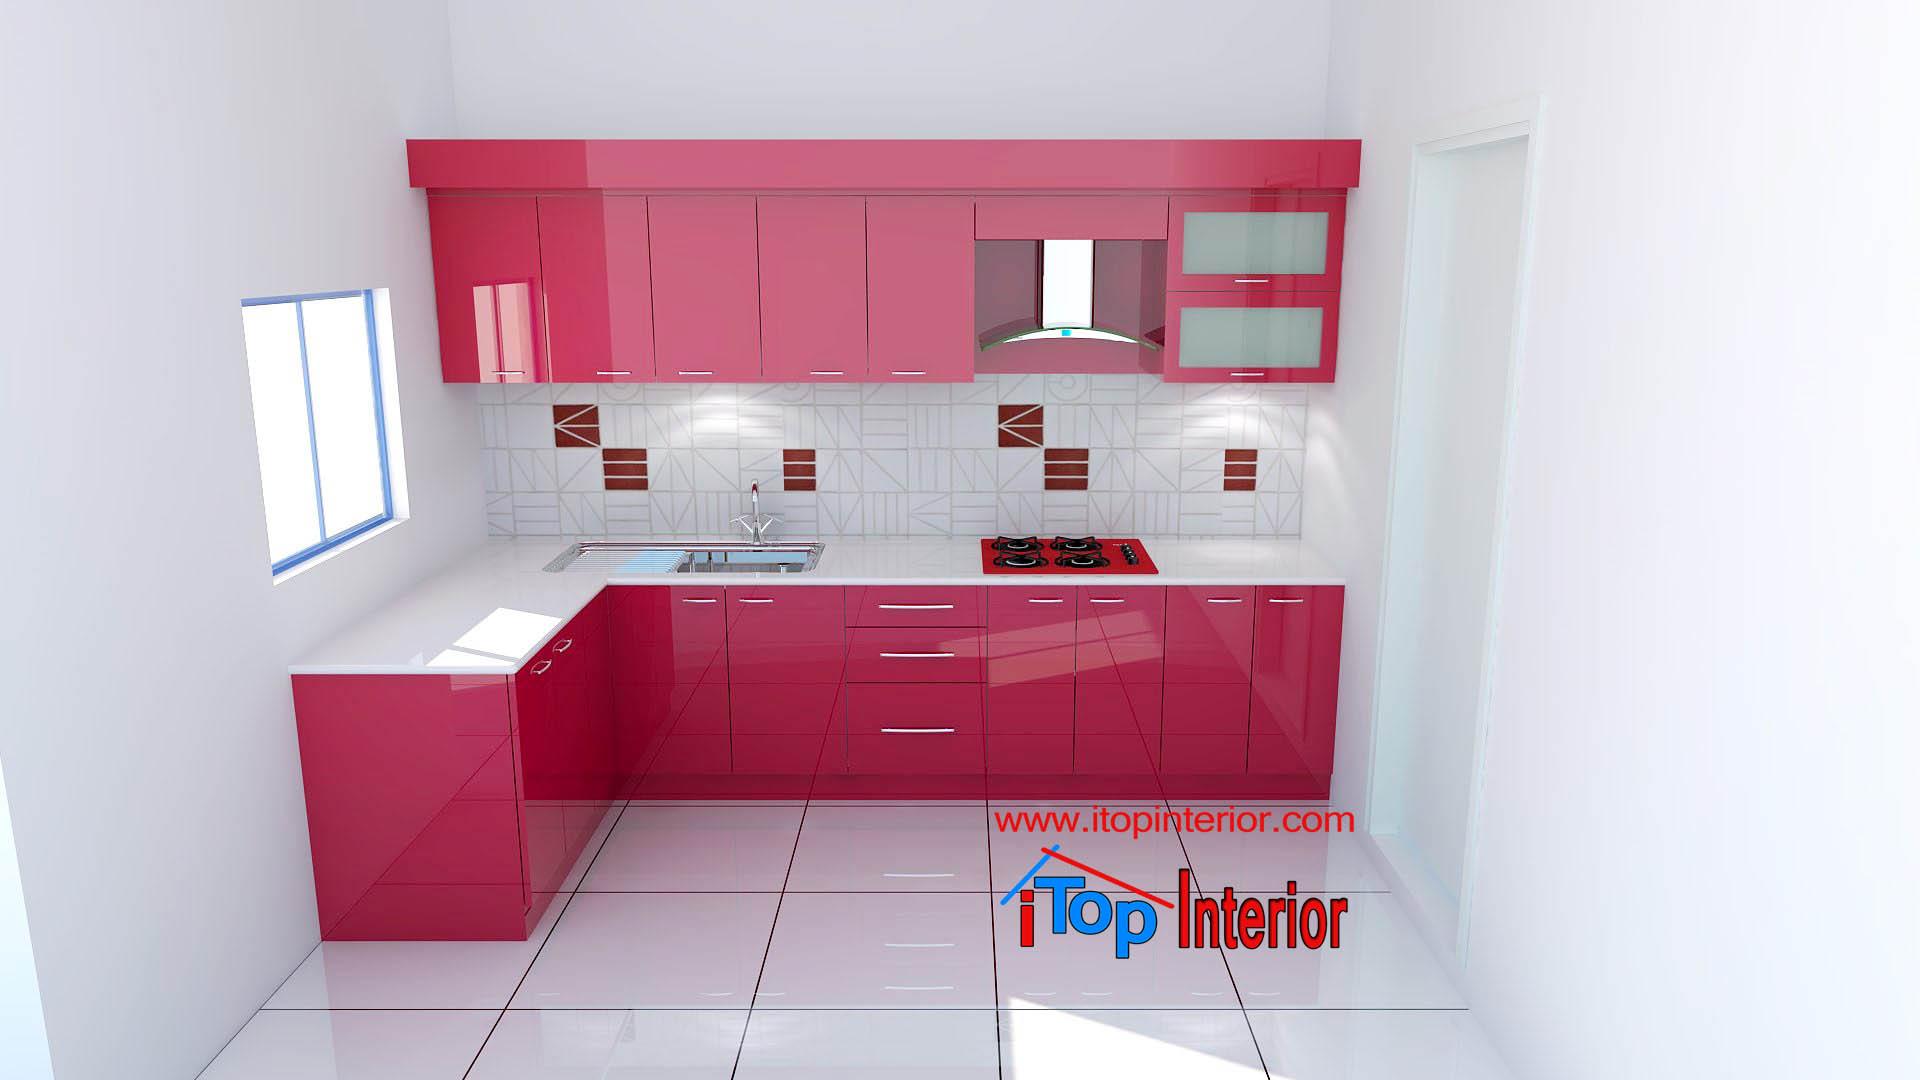 modular kitchen design bangalore itop intterior